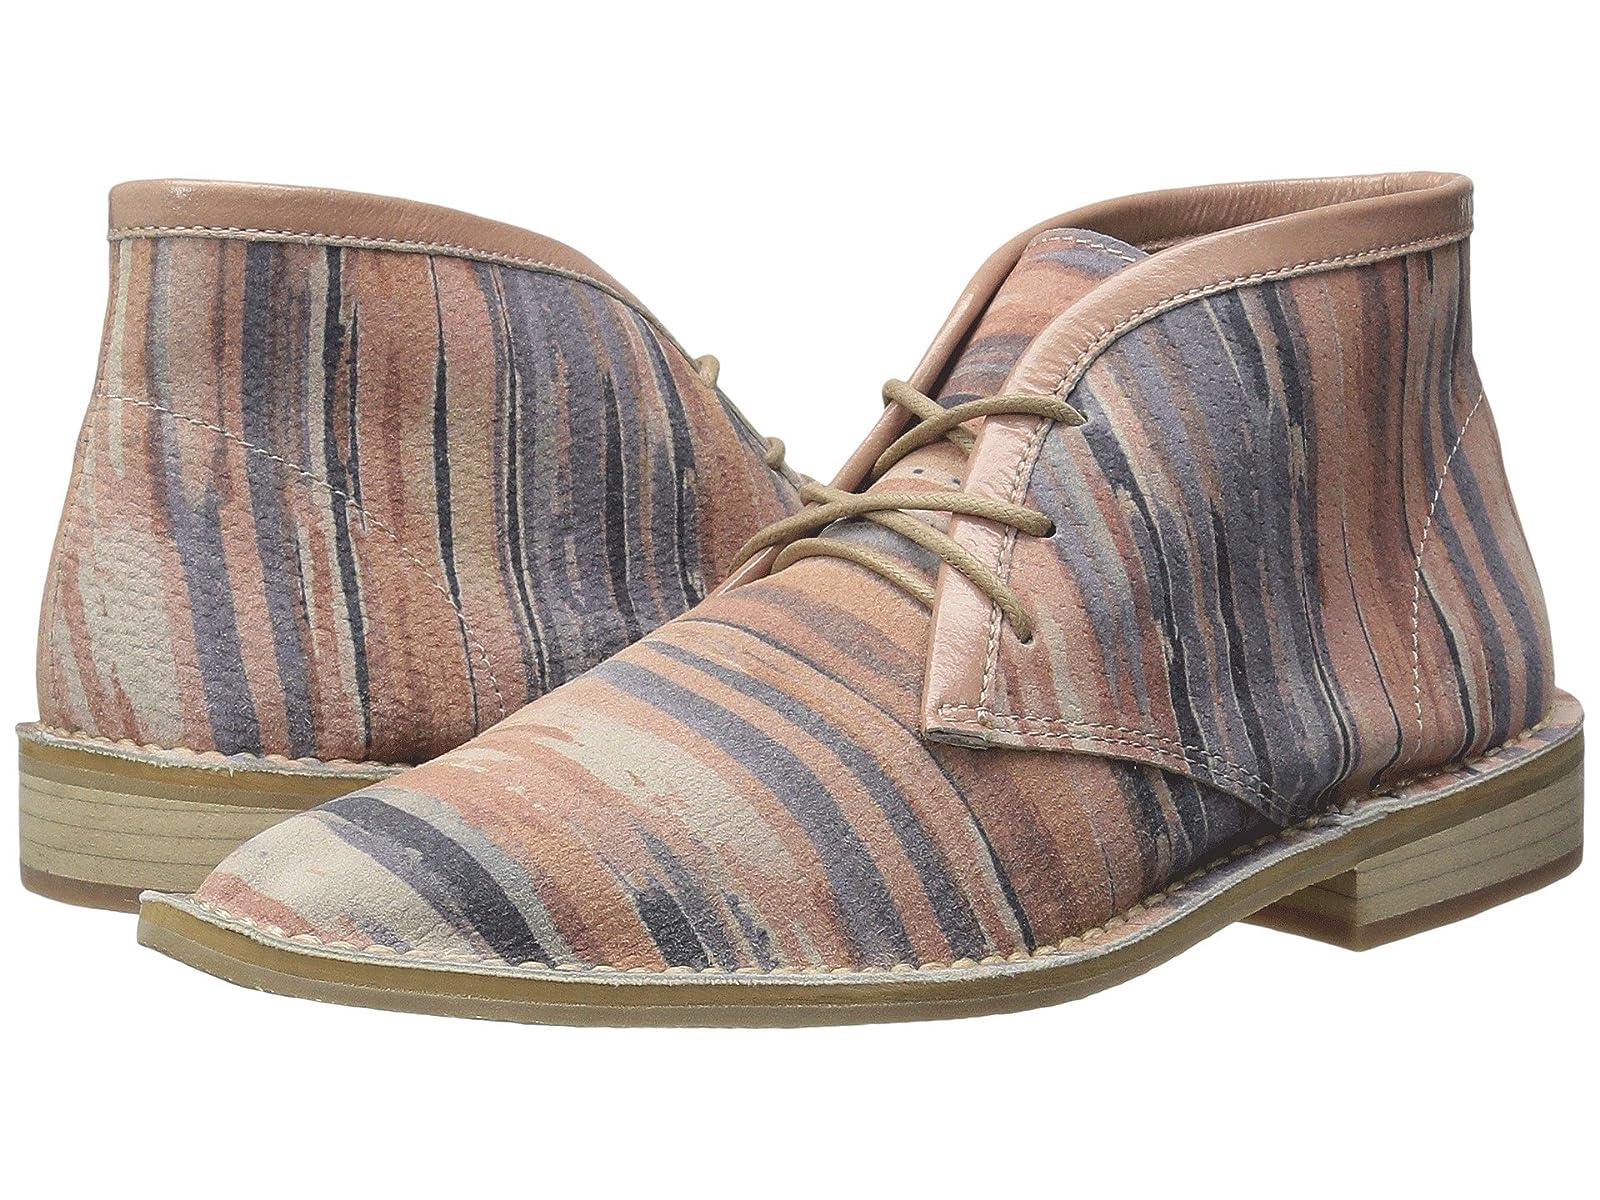 Kelsi Dagger Brooklyn WalworthCheap and distinctive eye-catching shoes